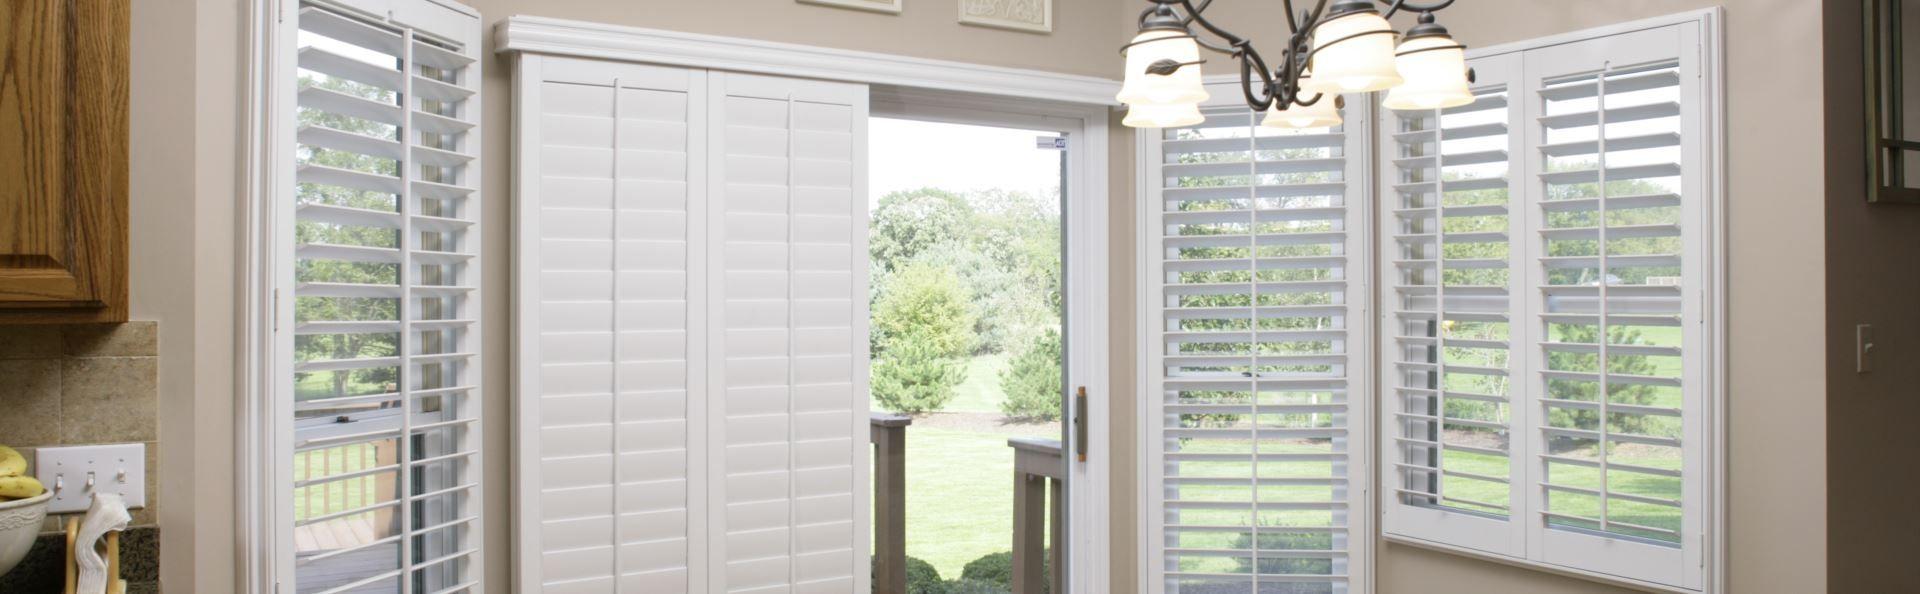 Pictures of shutters on sliding glass doors glass doors